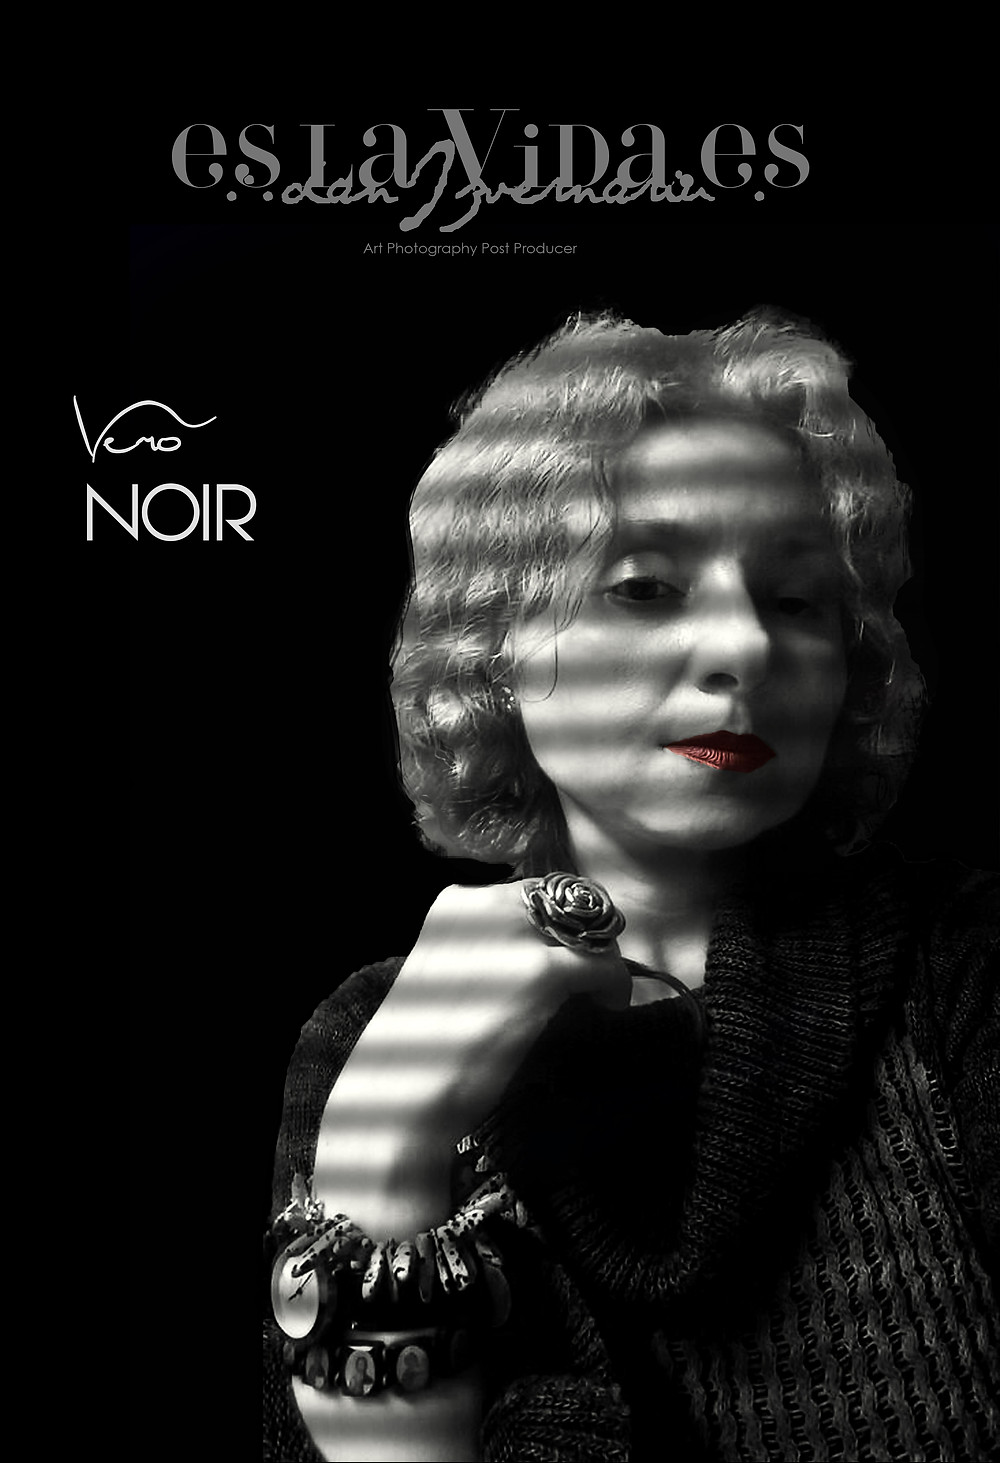 """Vero NOIR"", french noir portrait 1940, Post Production by Dan Izvernariu, Madrid Es Nov.2017"